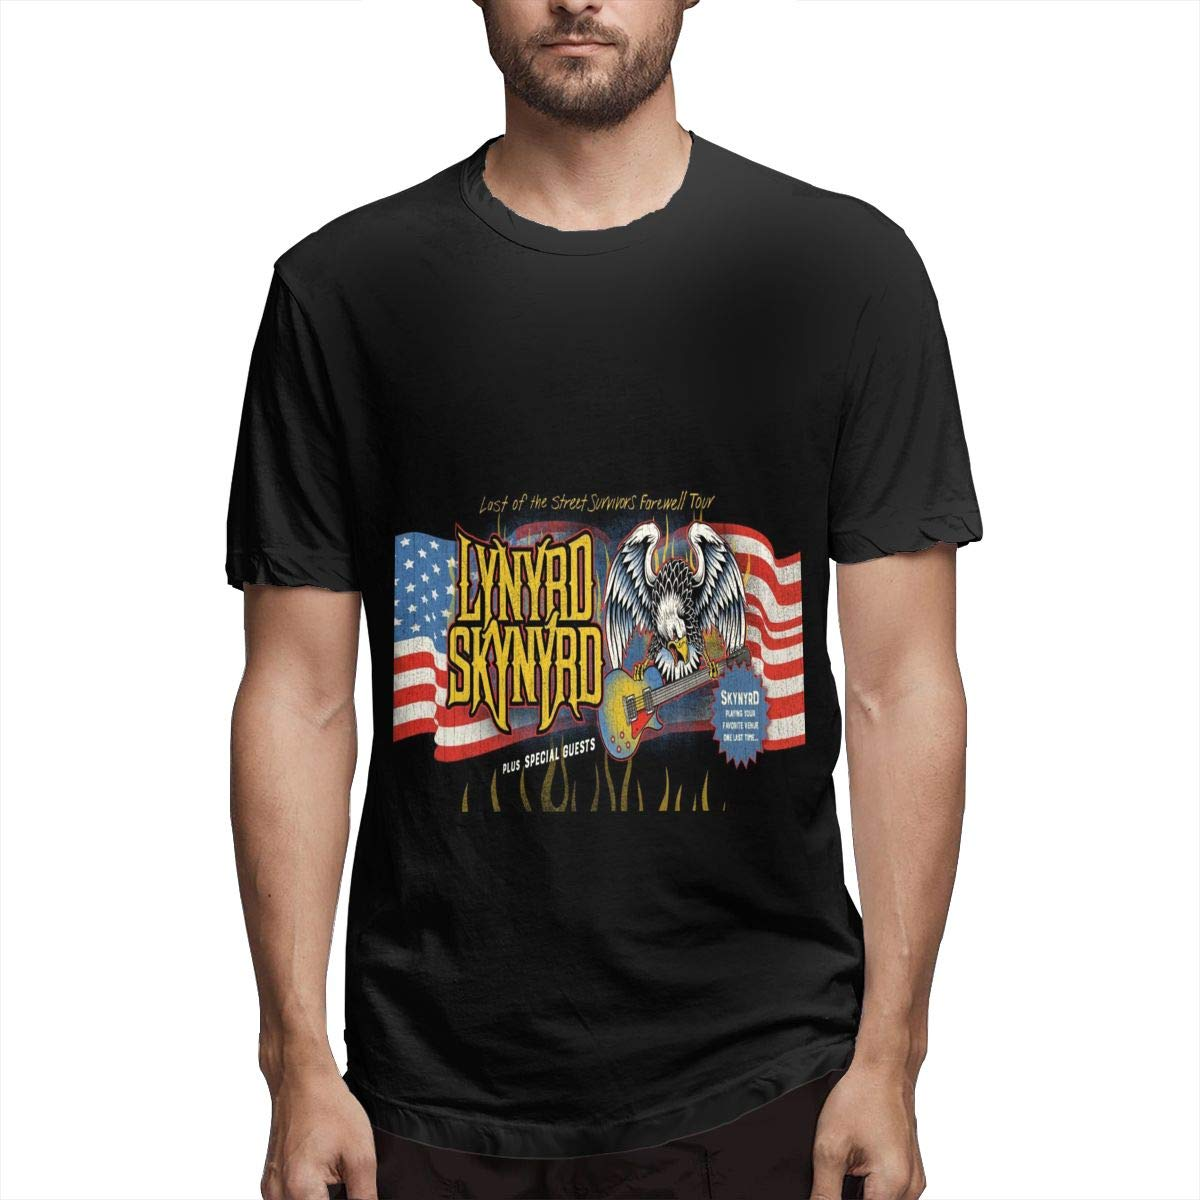 Lihehen Man Last Of The Street Survivors Farewell Tour Retro Printing Round Neck T Shirt